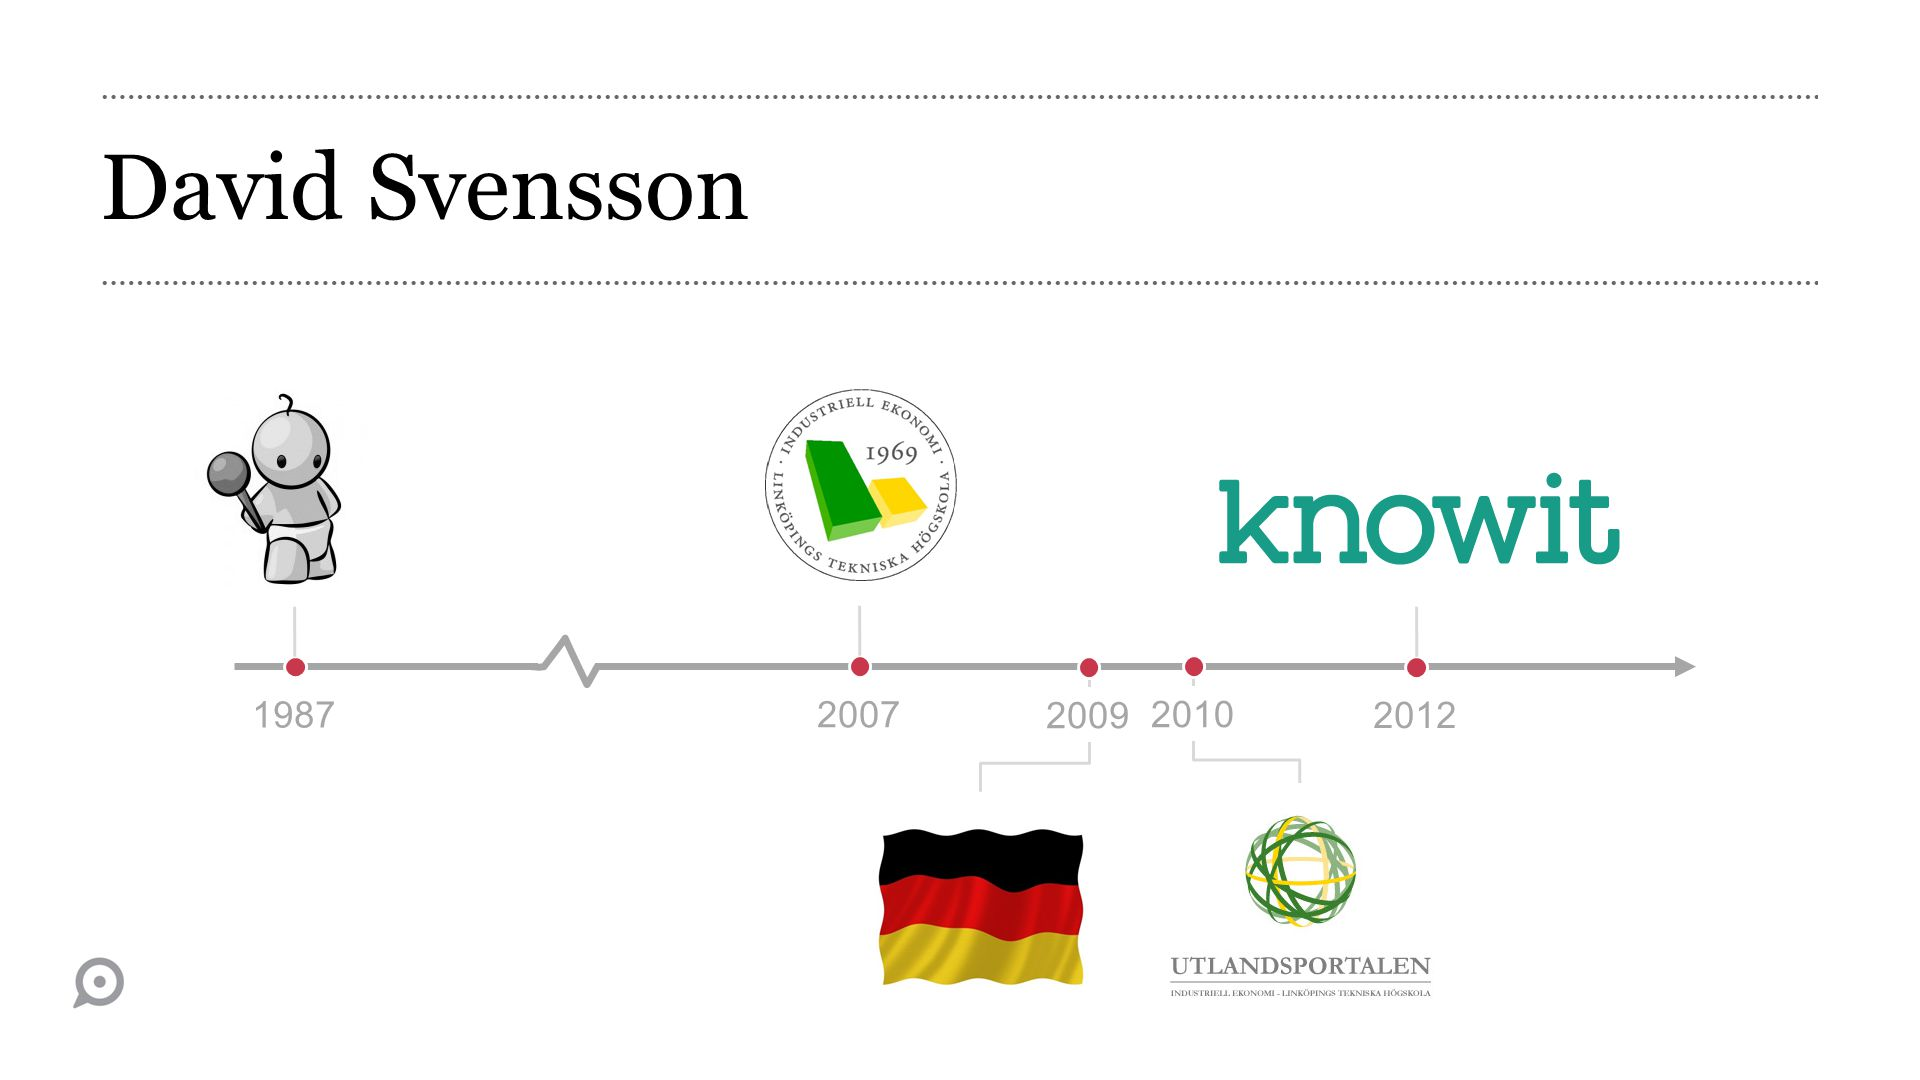 David Svensson 1987 2007 2012 2009 2010